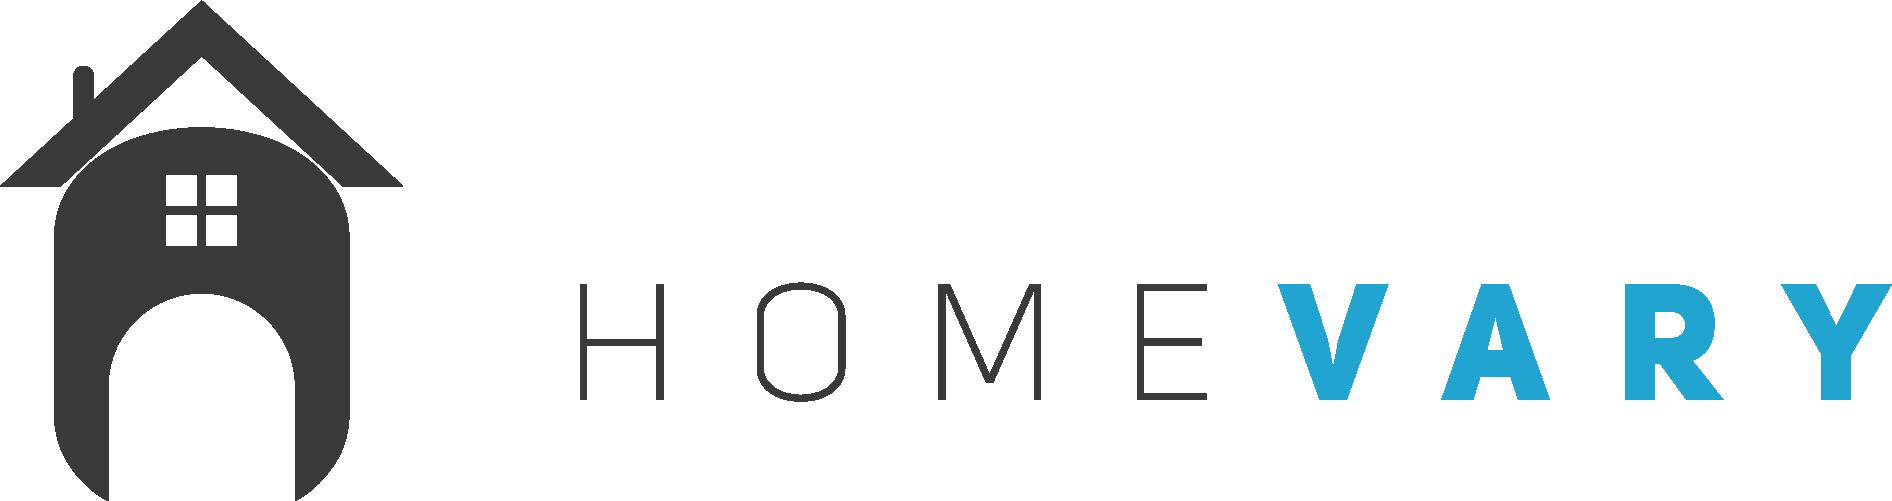 Homevary